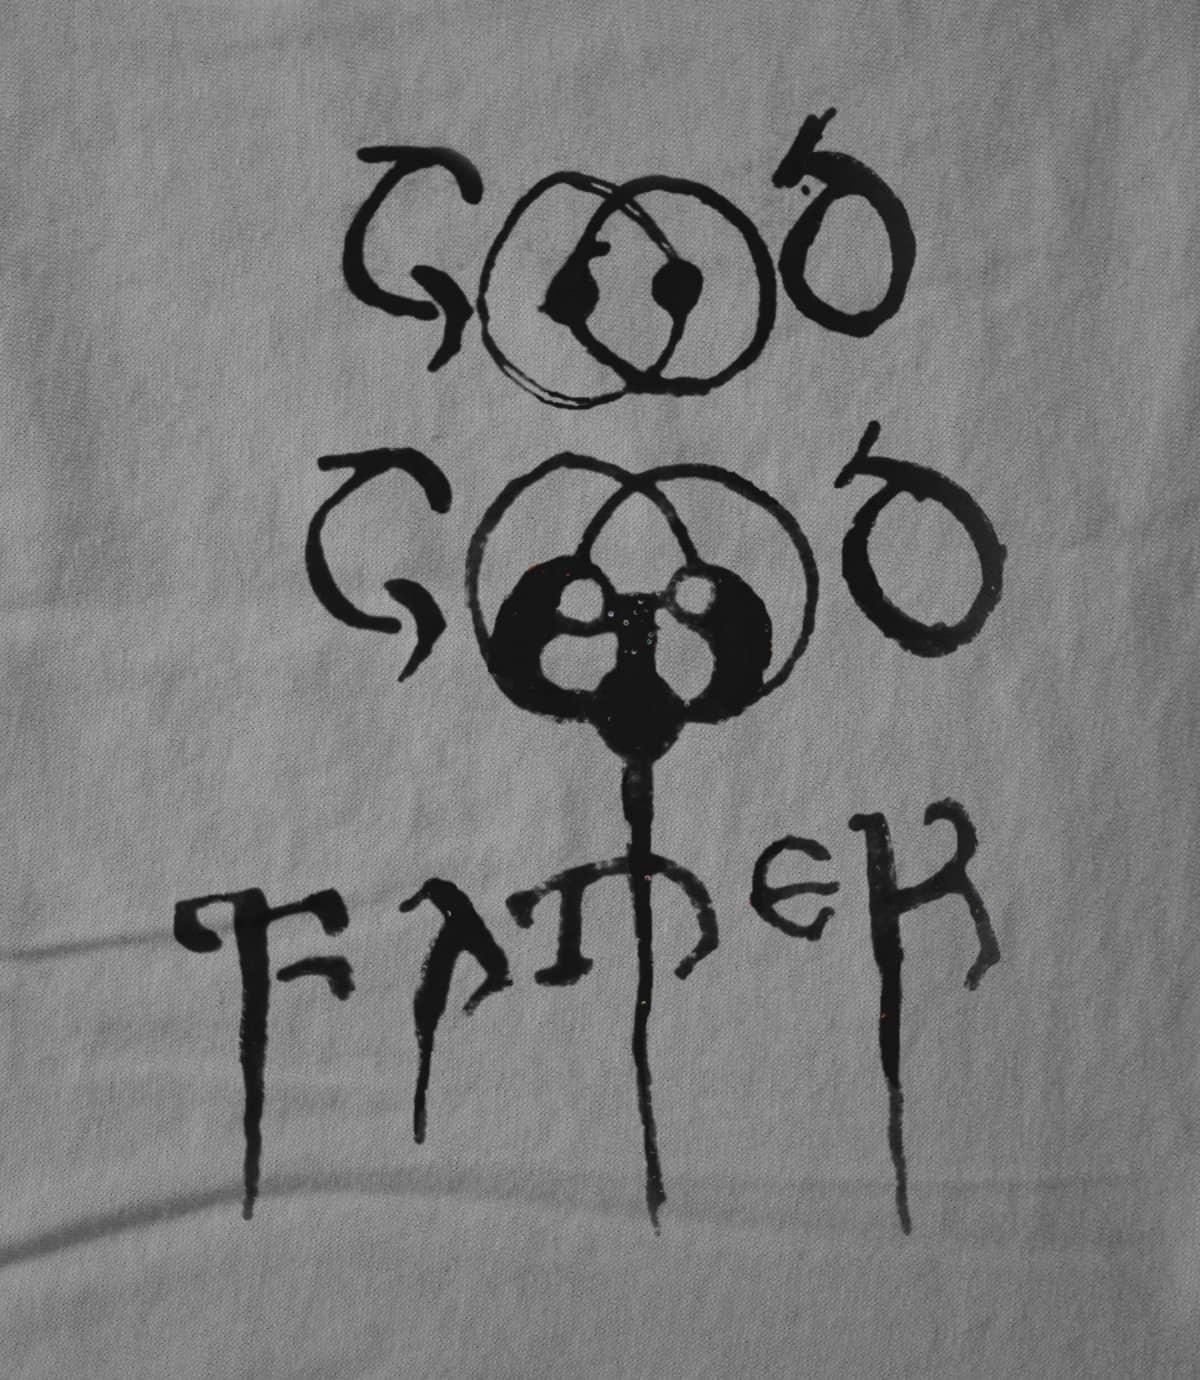 Good God Father